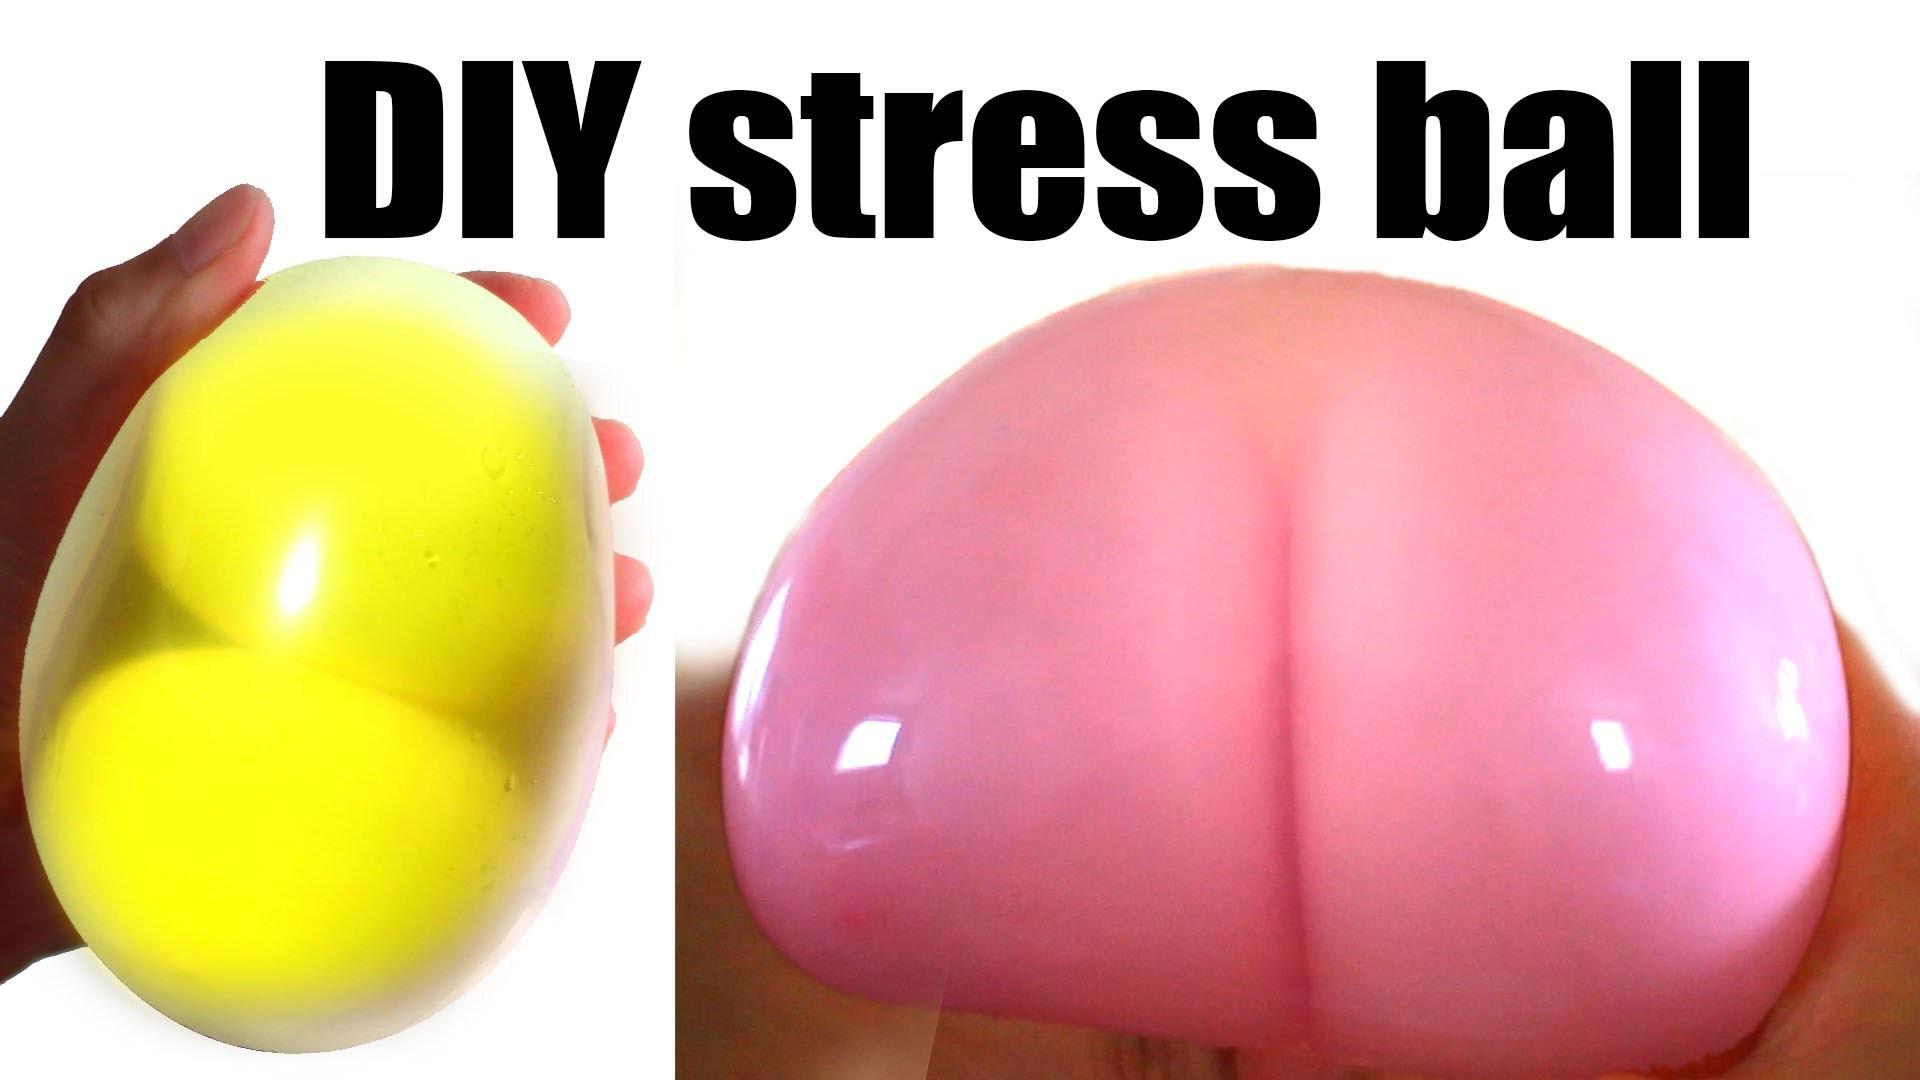 Diy Stress Ball  DIY Stress ball Butt stress ball Egg stress ball